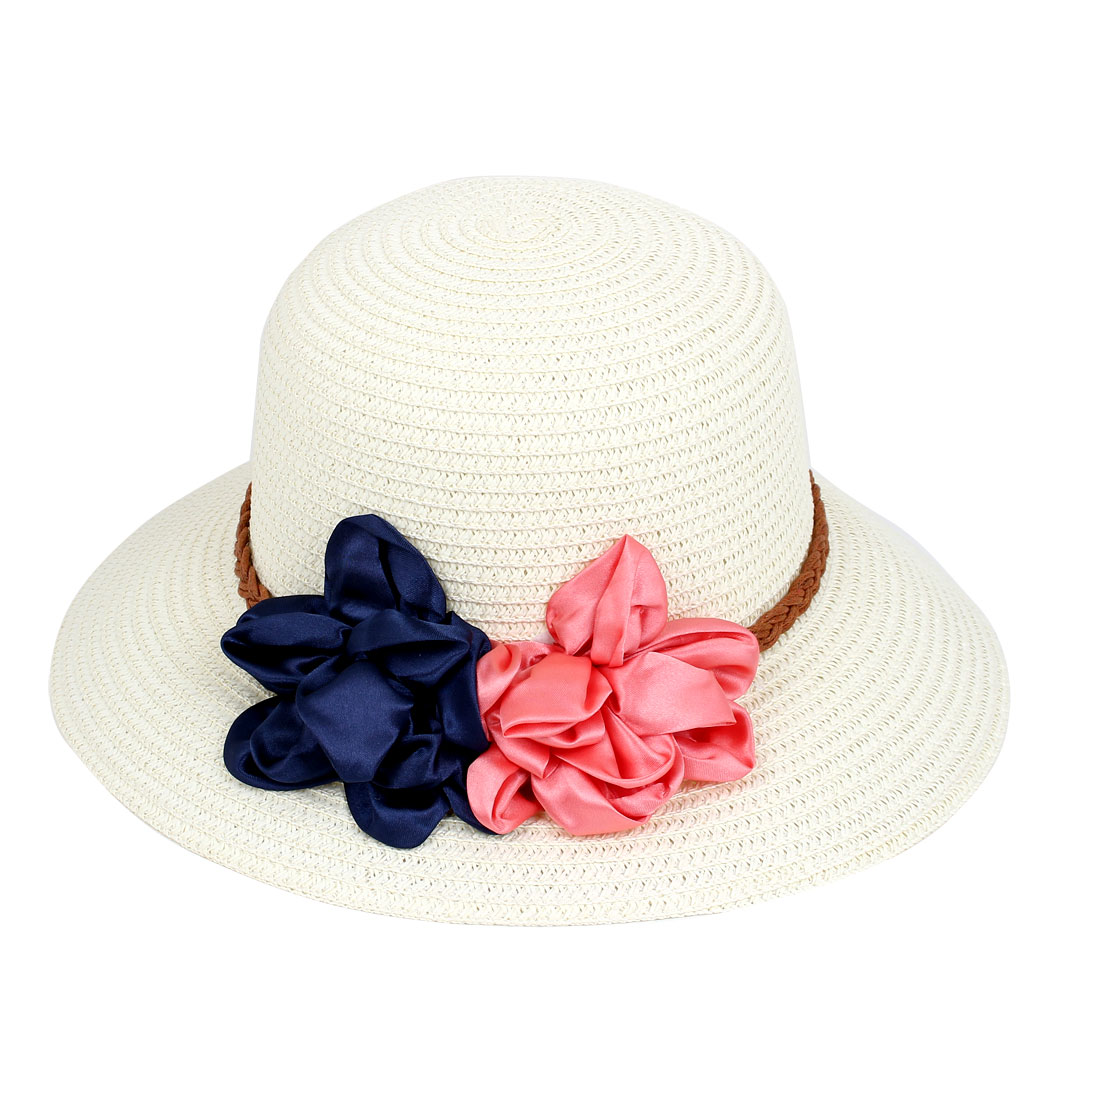 Lady Women Vacation Summer Beach Sun Floppy Wide Brim Floral ... 10de4f7e52fe